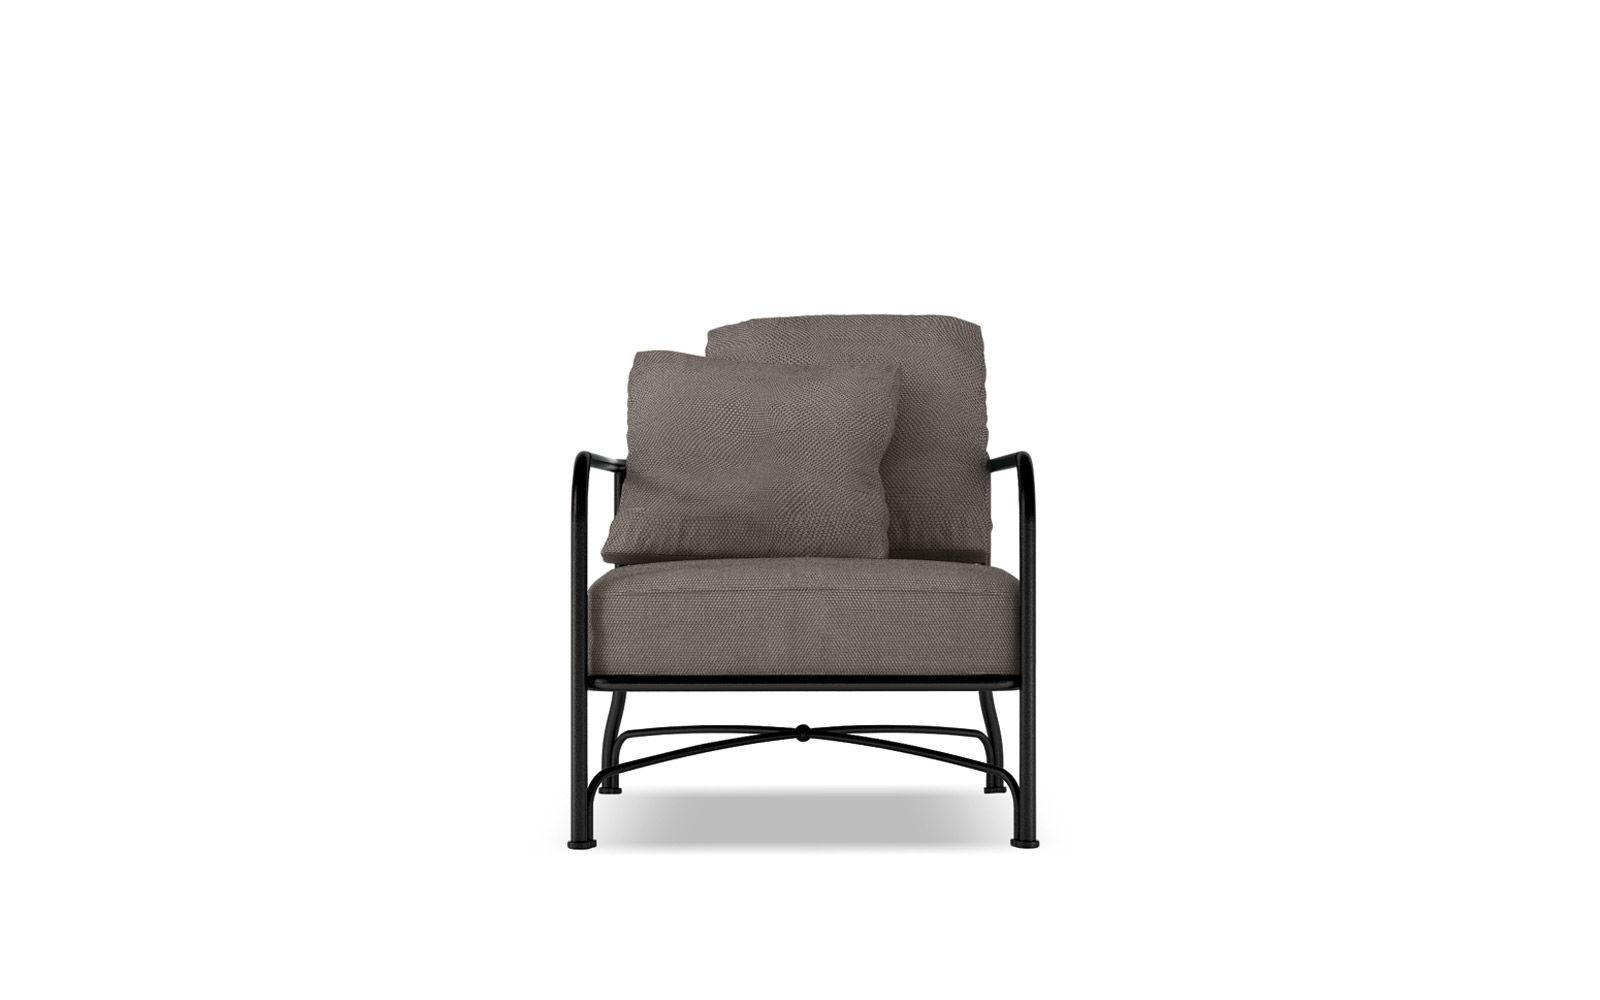 gro artig outdoor living gartenm bel galerie die besten. Black Bedroom Furniture Sets. Home Design Ideas